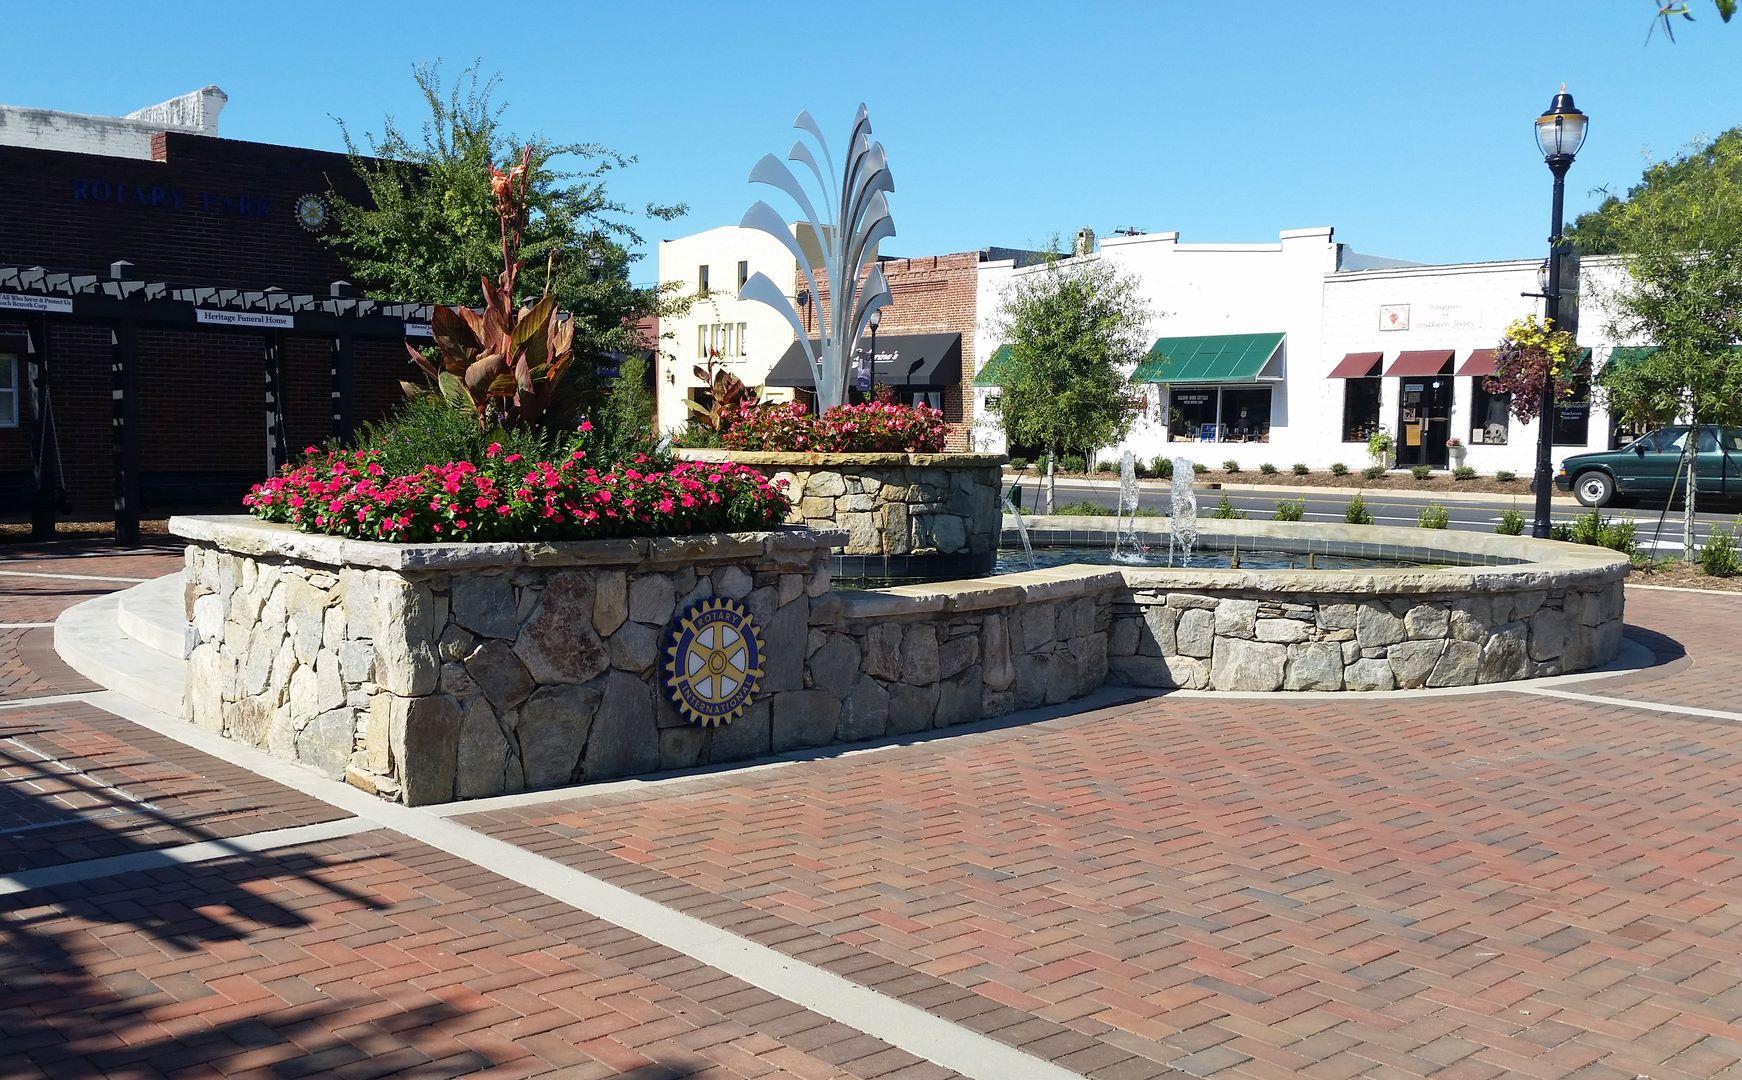 City of Fountain Inn, SC